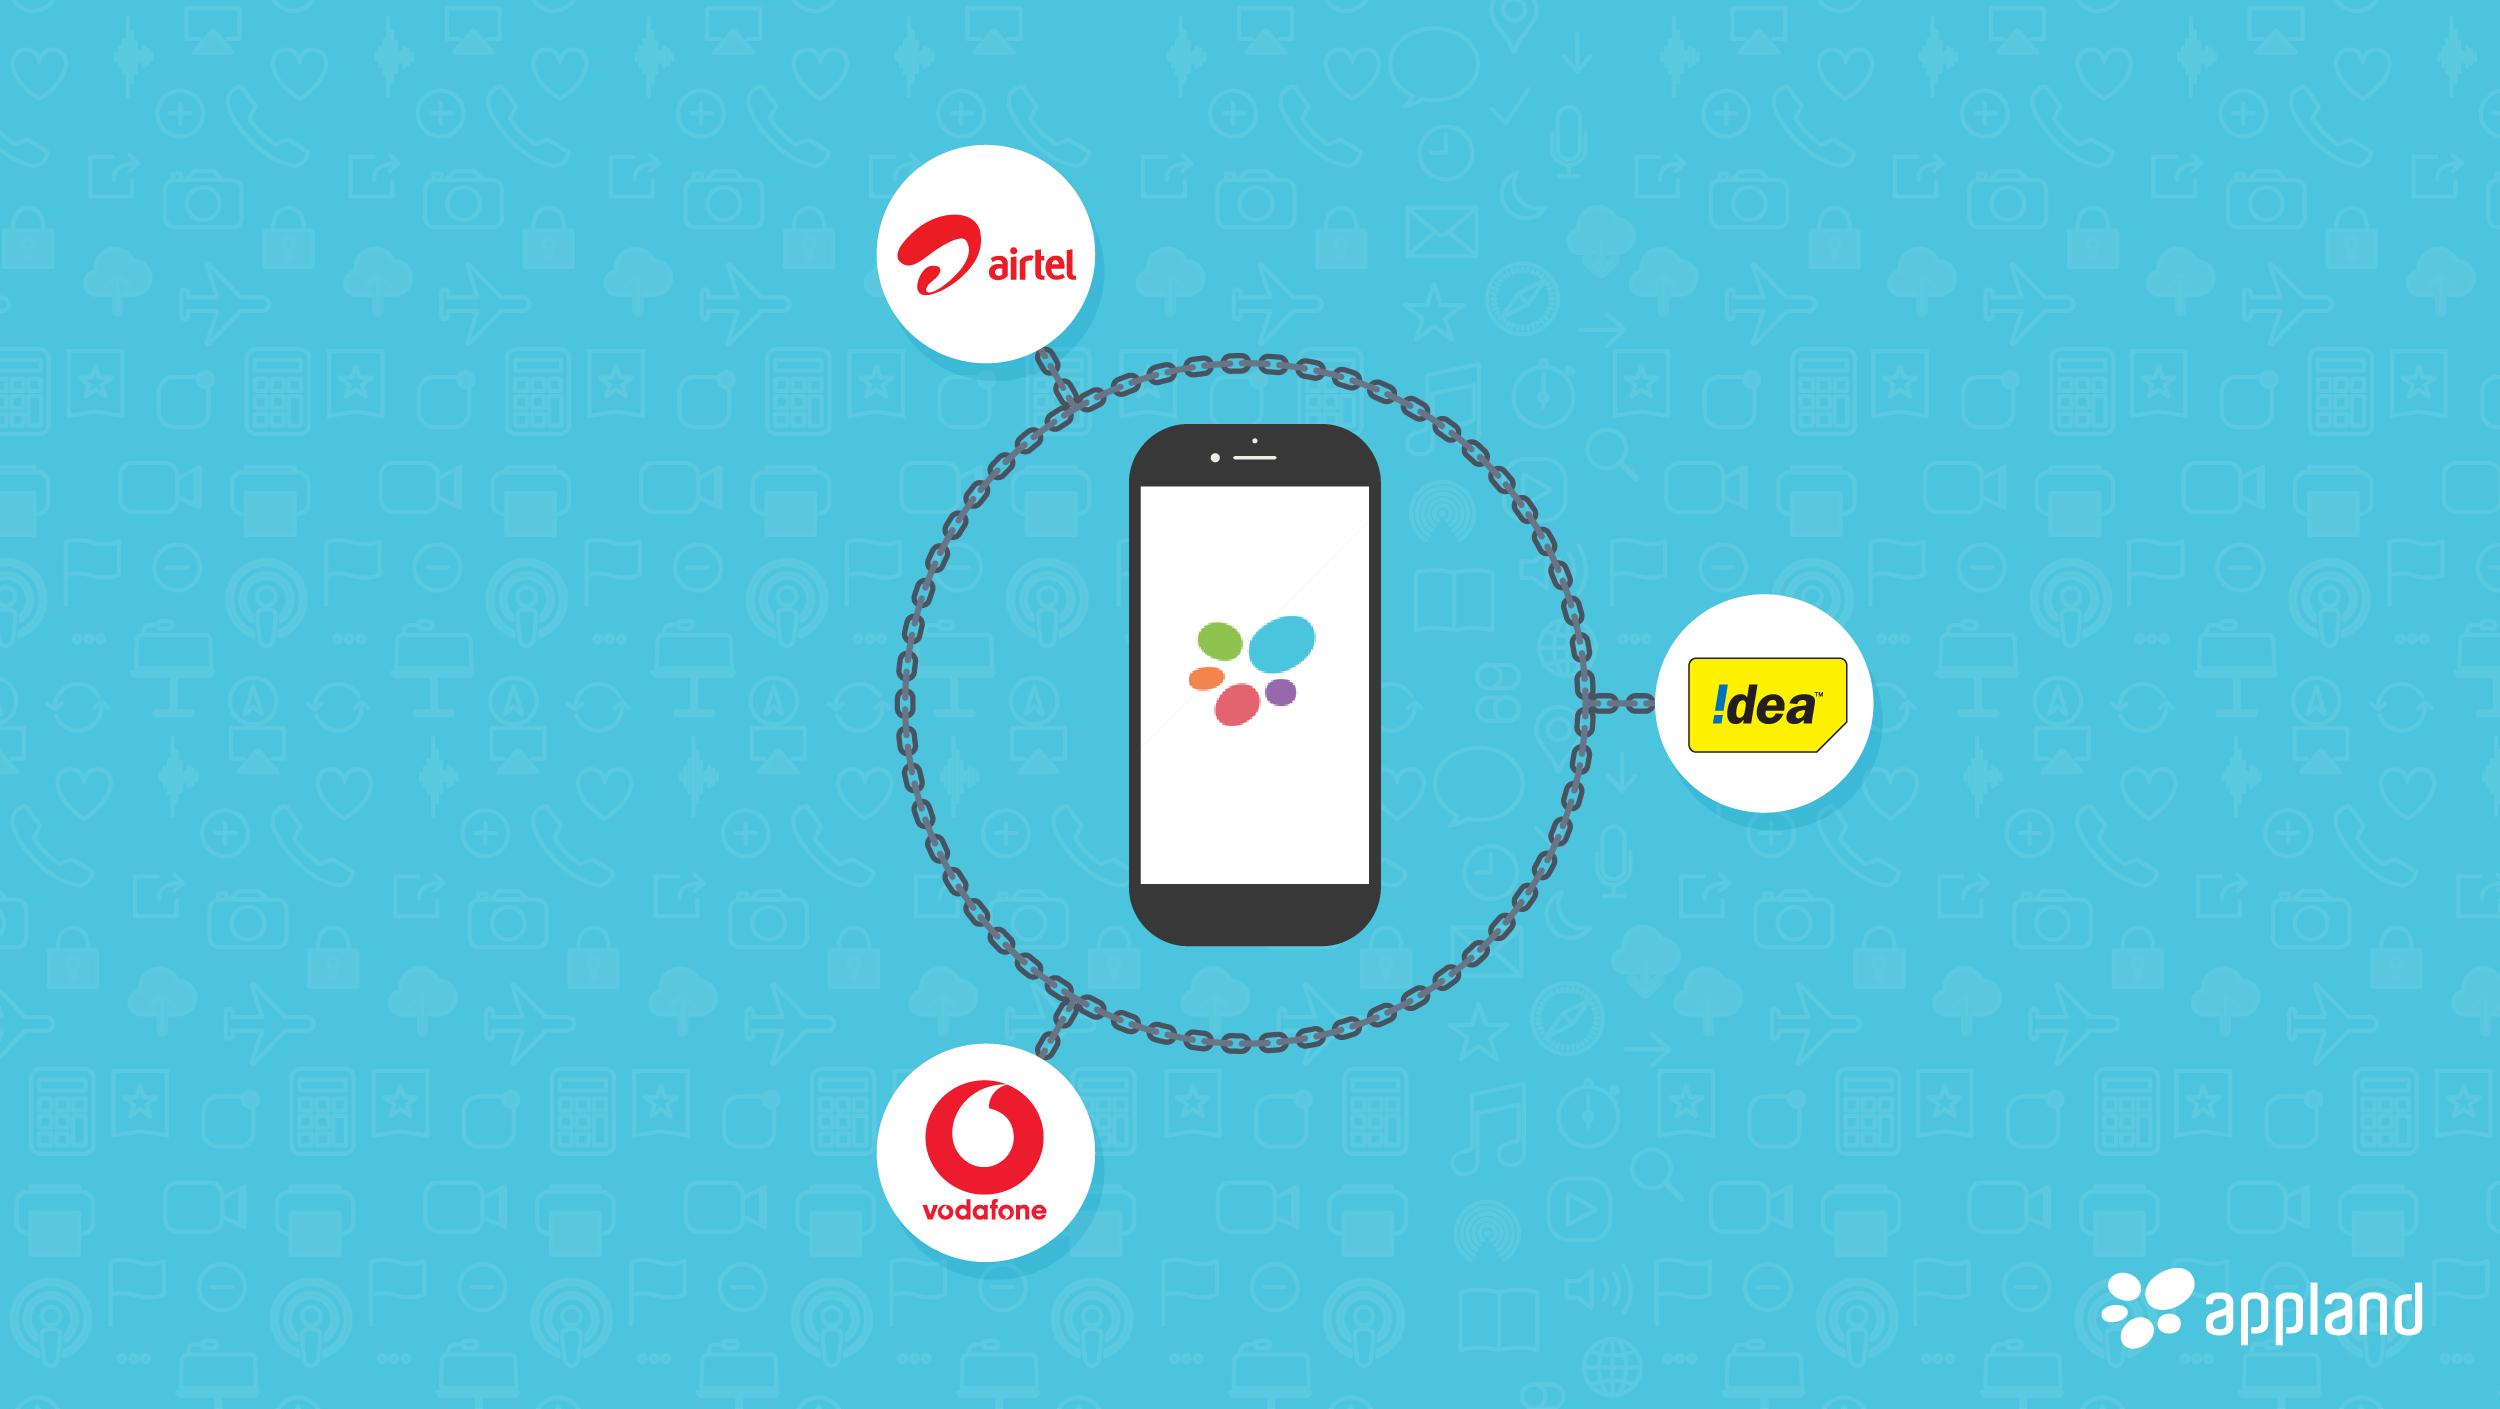 Value Added Services Airtel Idea Vodafone